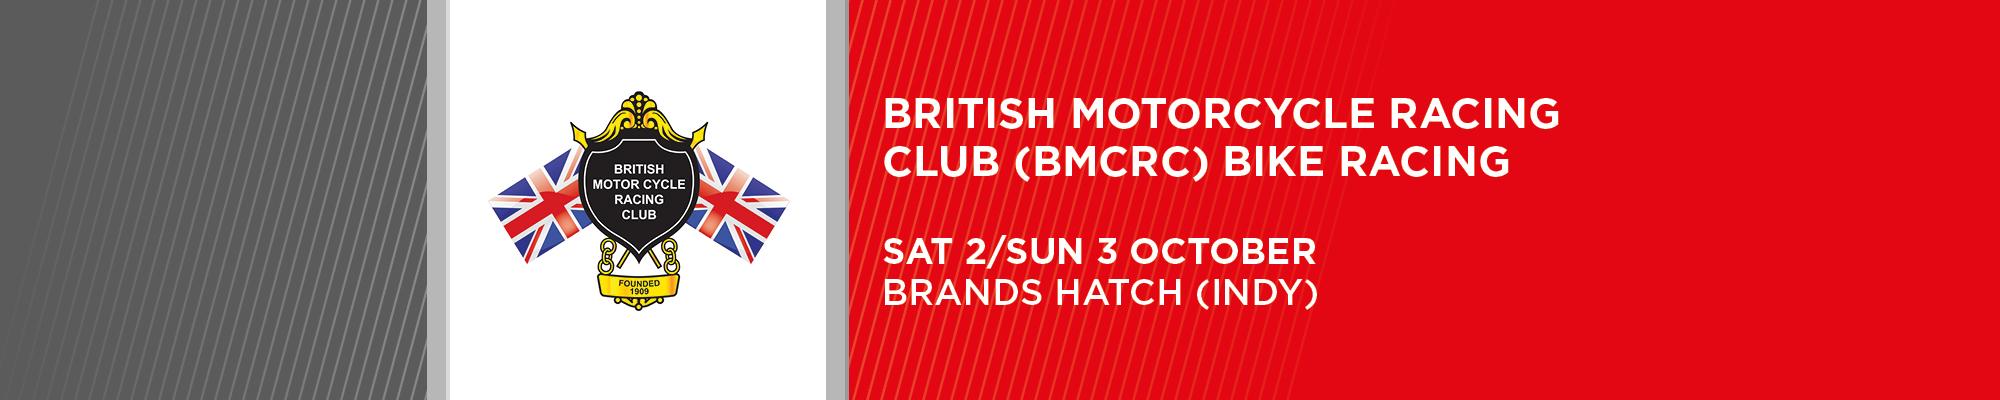 BMCRC Club Bike Championships